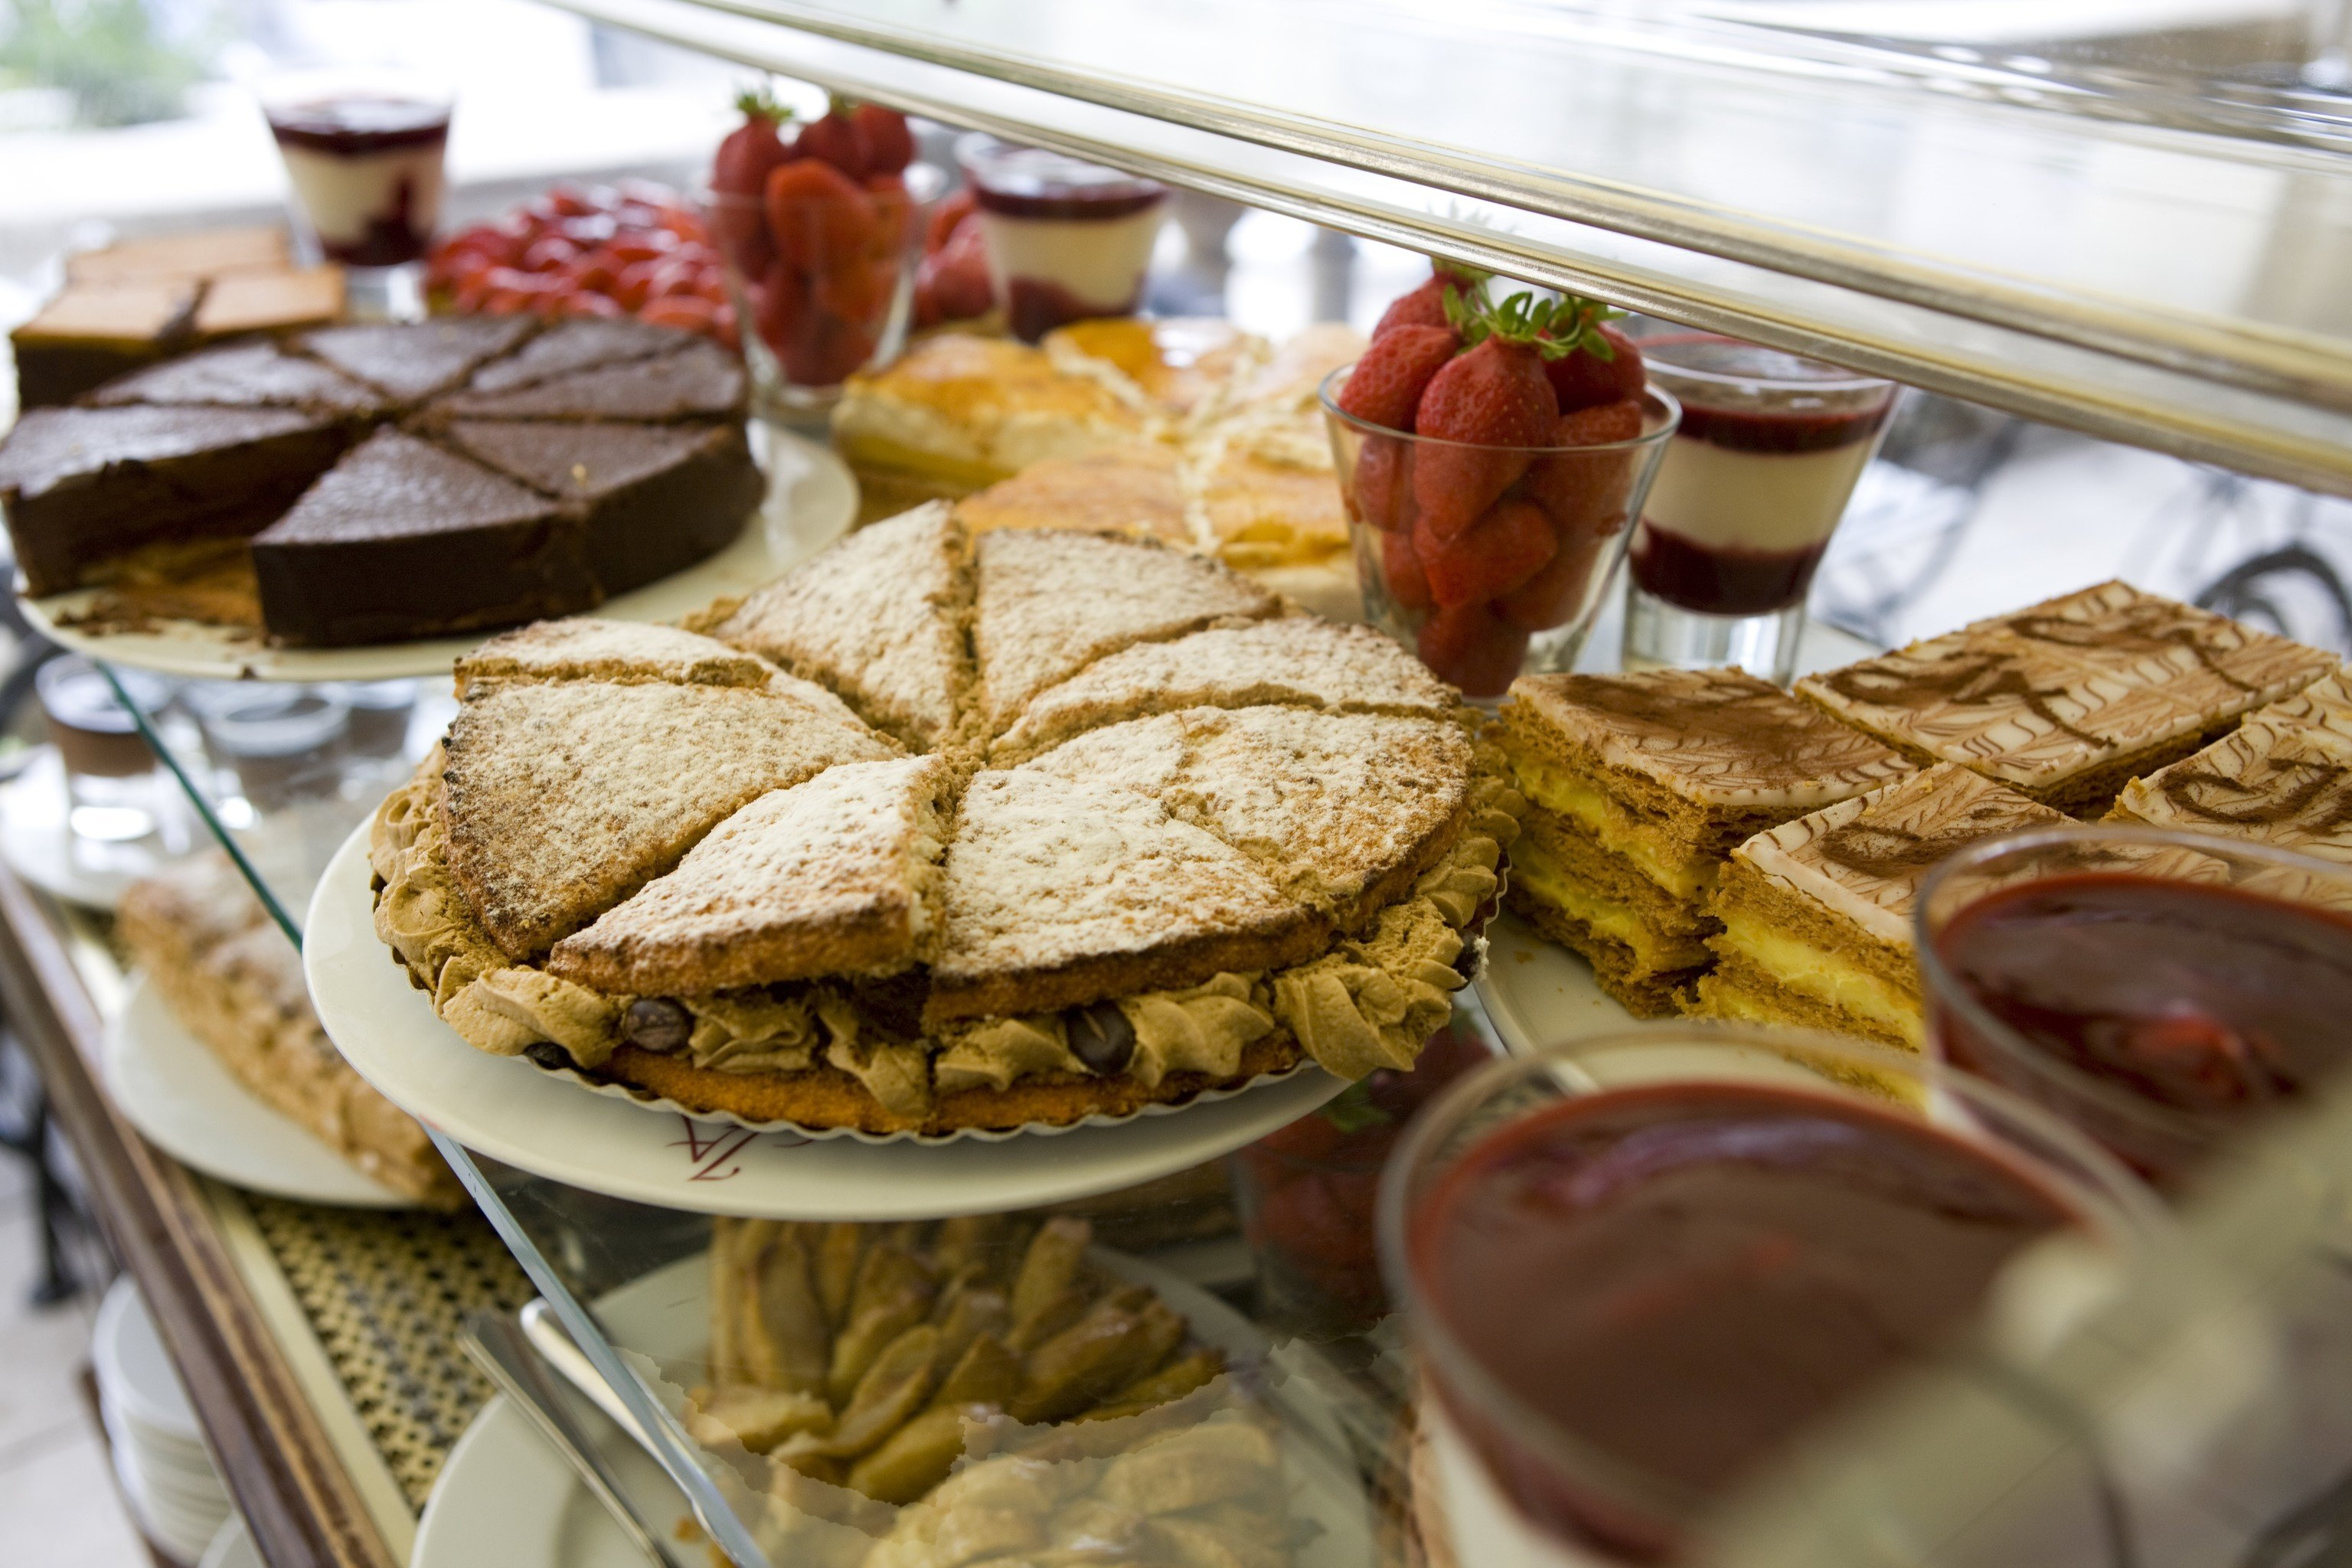 Food + Drink food dish meal breakfast brunch lunch baking produce snack food